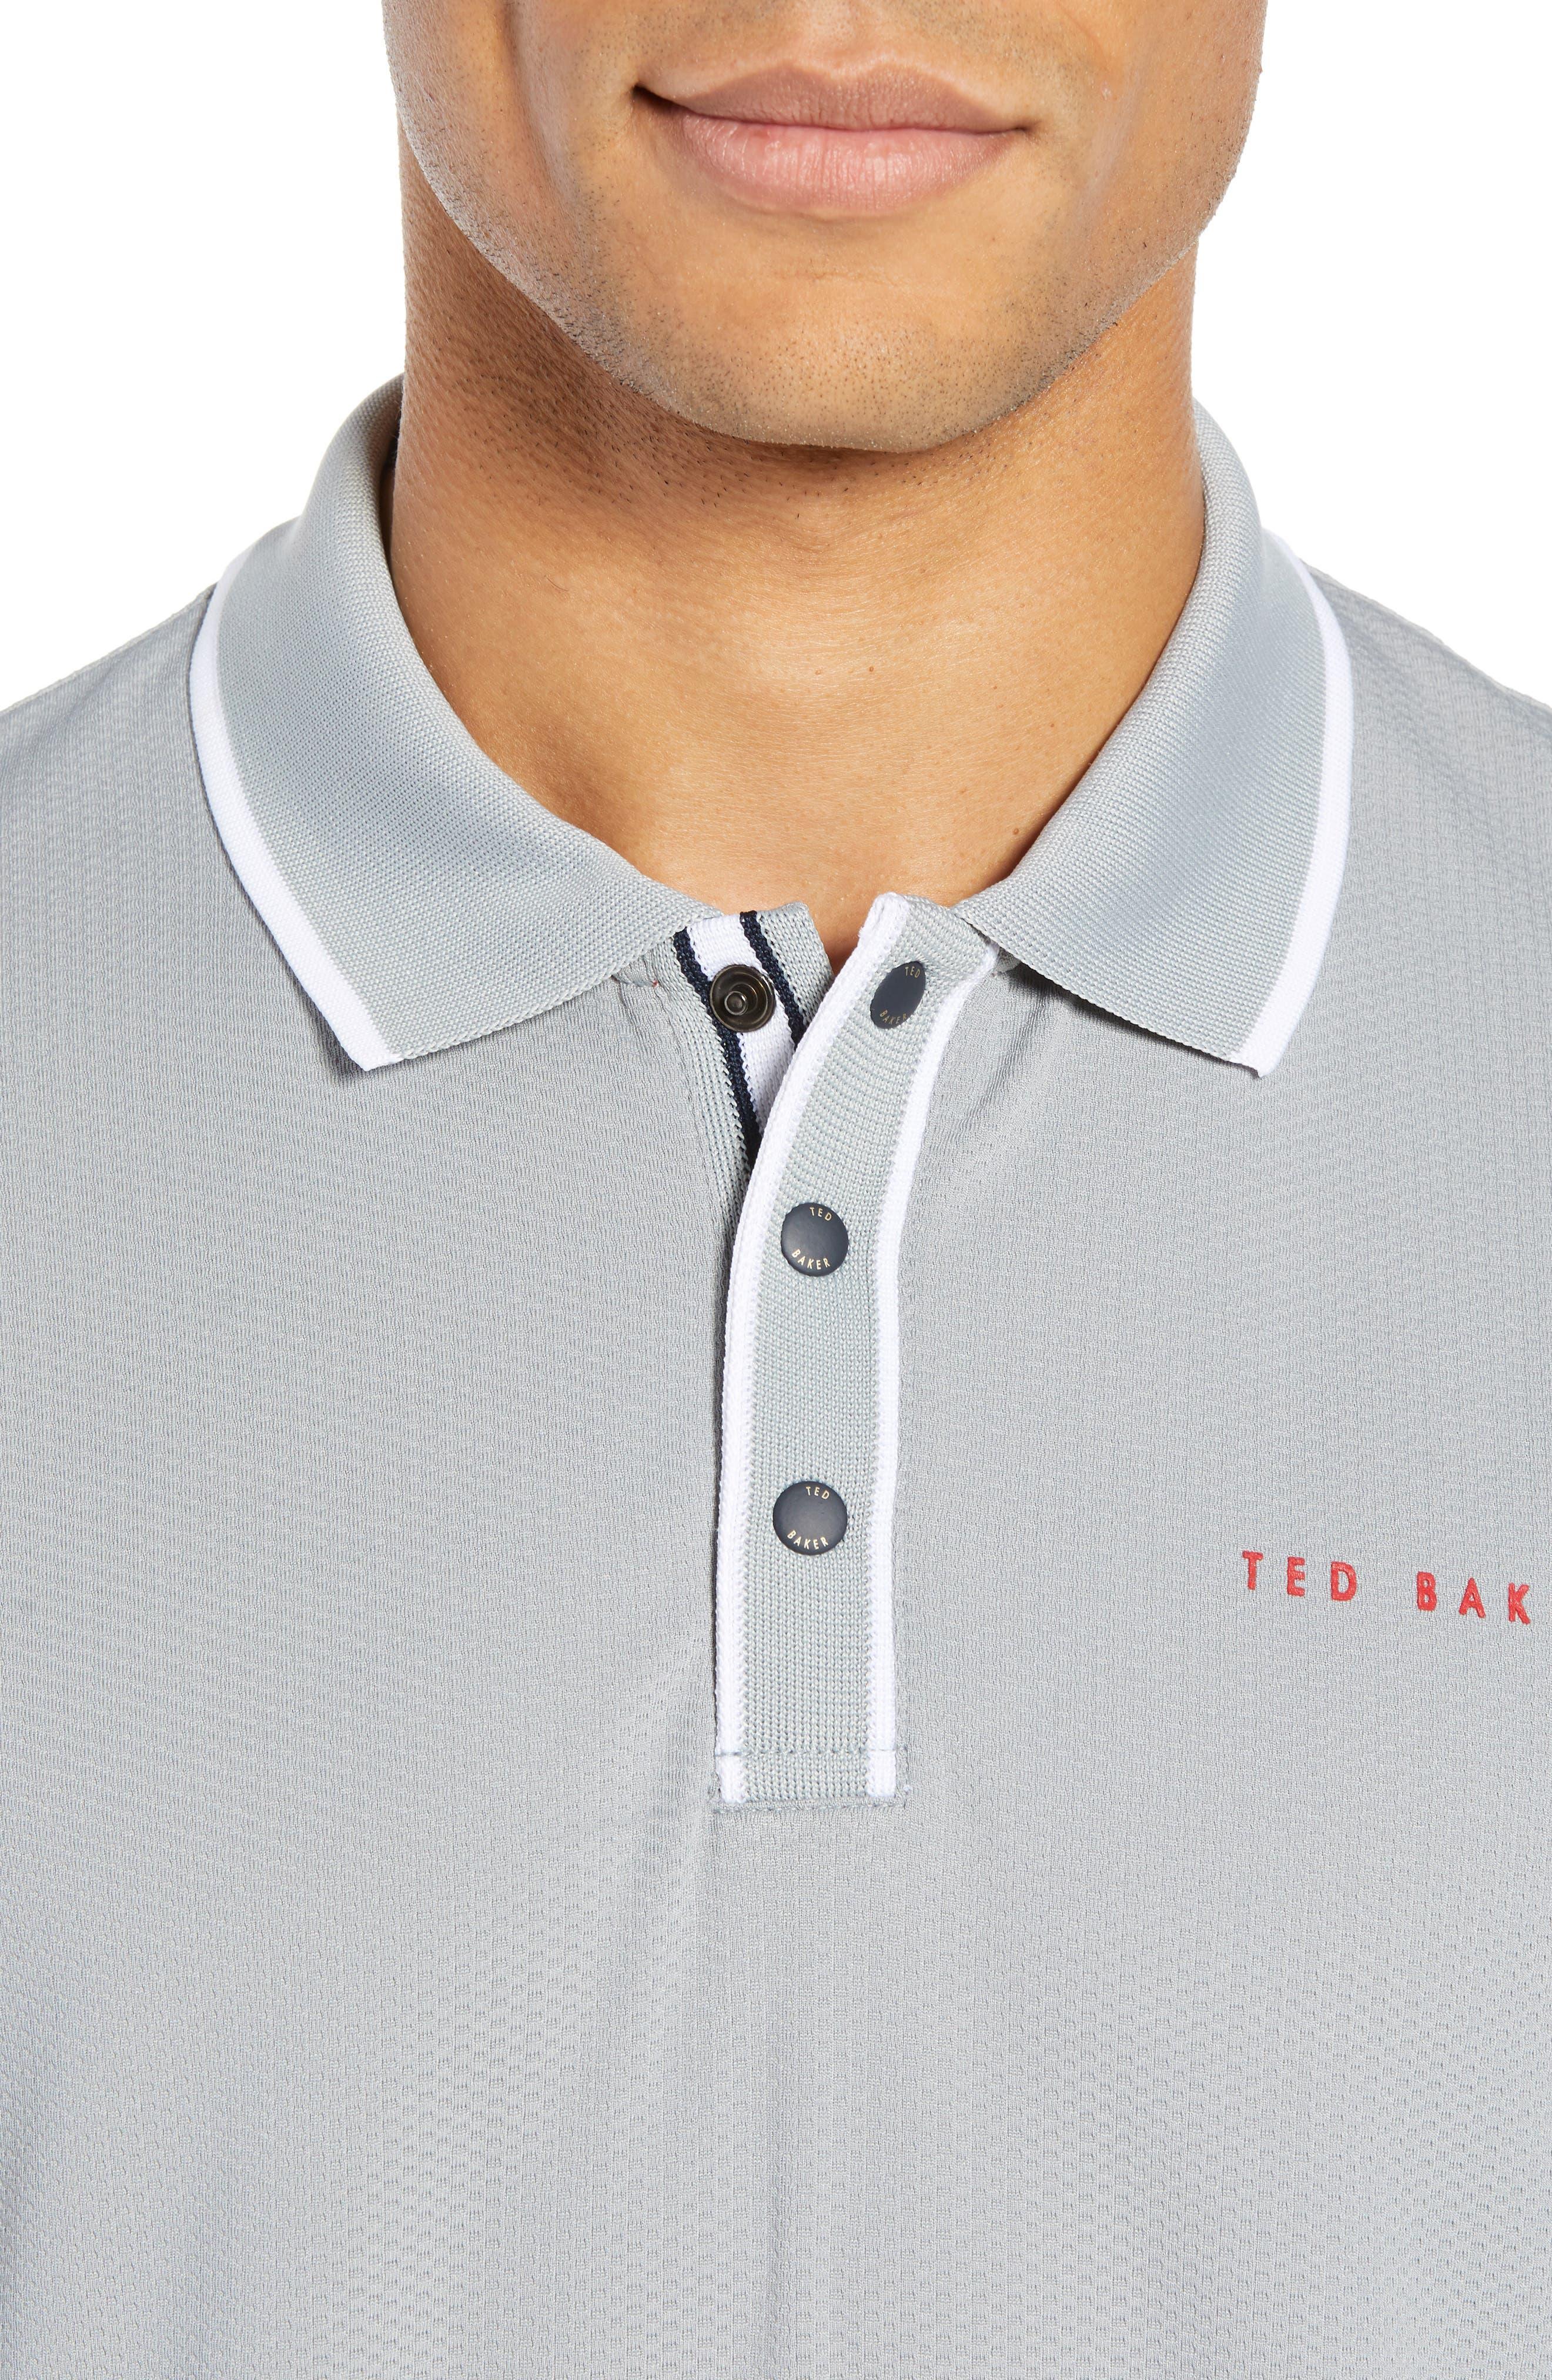 TED BAKER LONDON,                             Bunka Trim Fit Golf Polo,                             Alternate thumbnail 4, color,                             LT-GREY